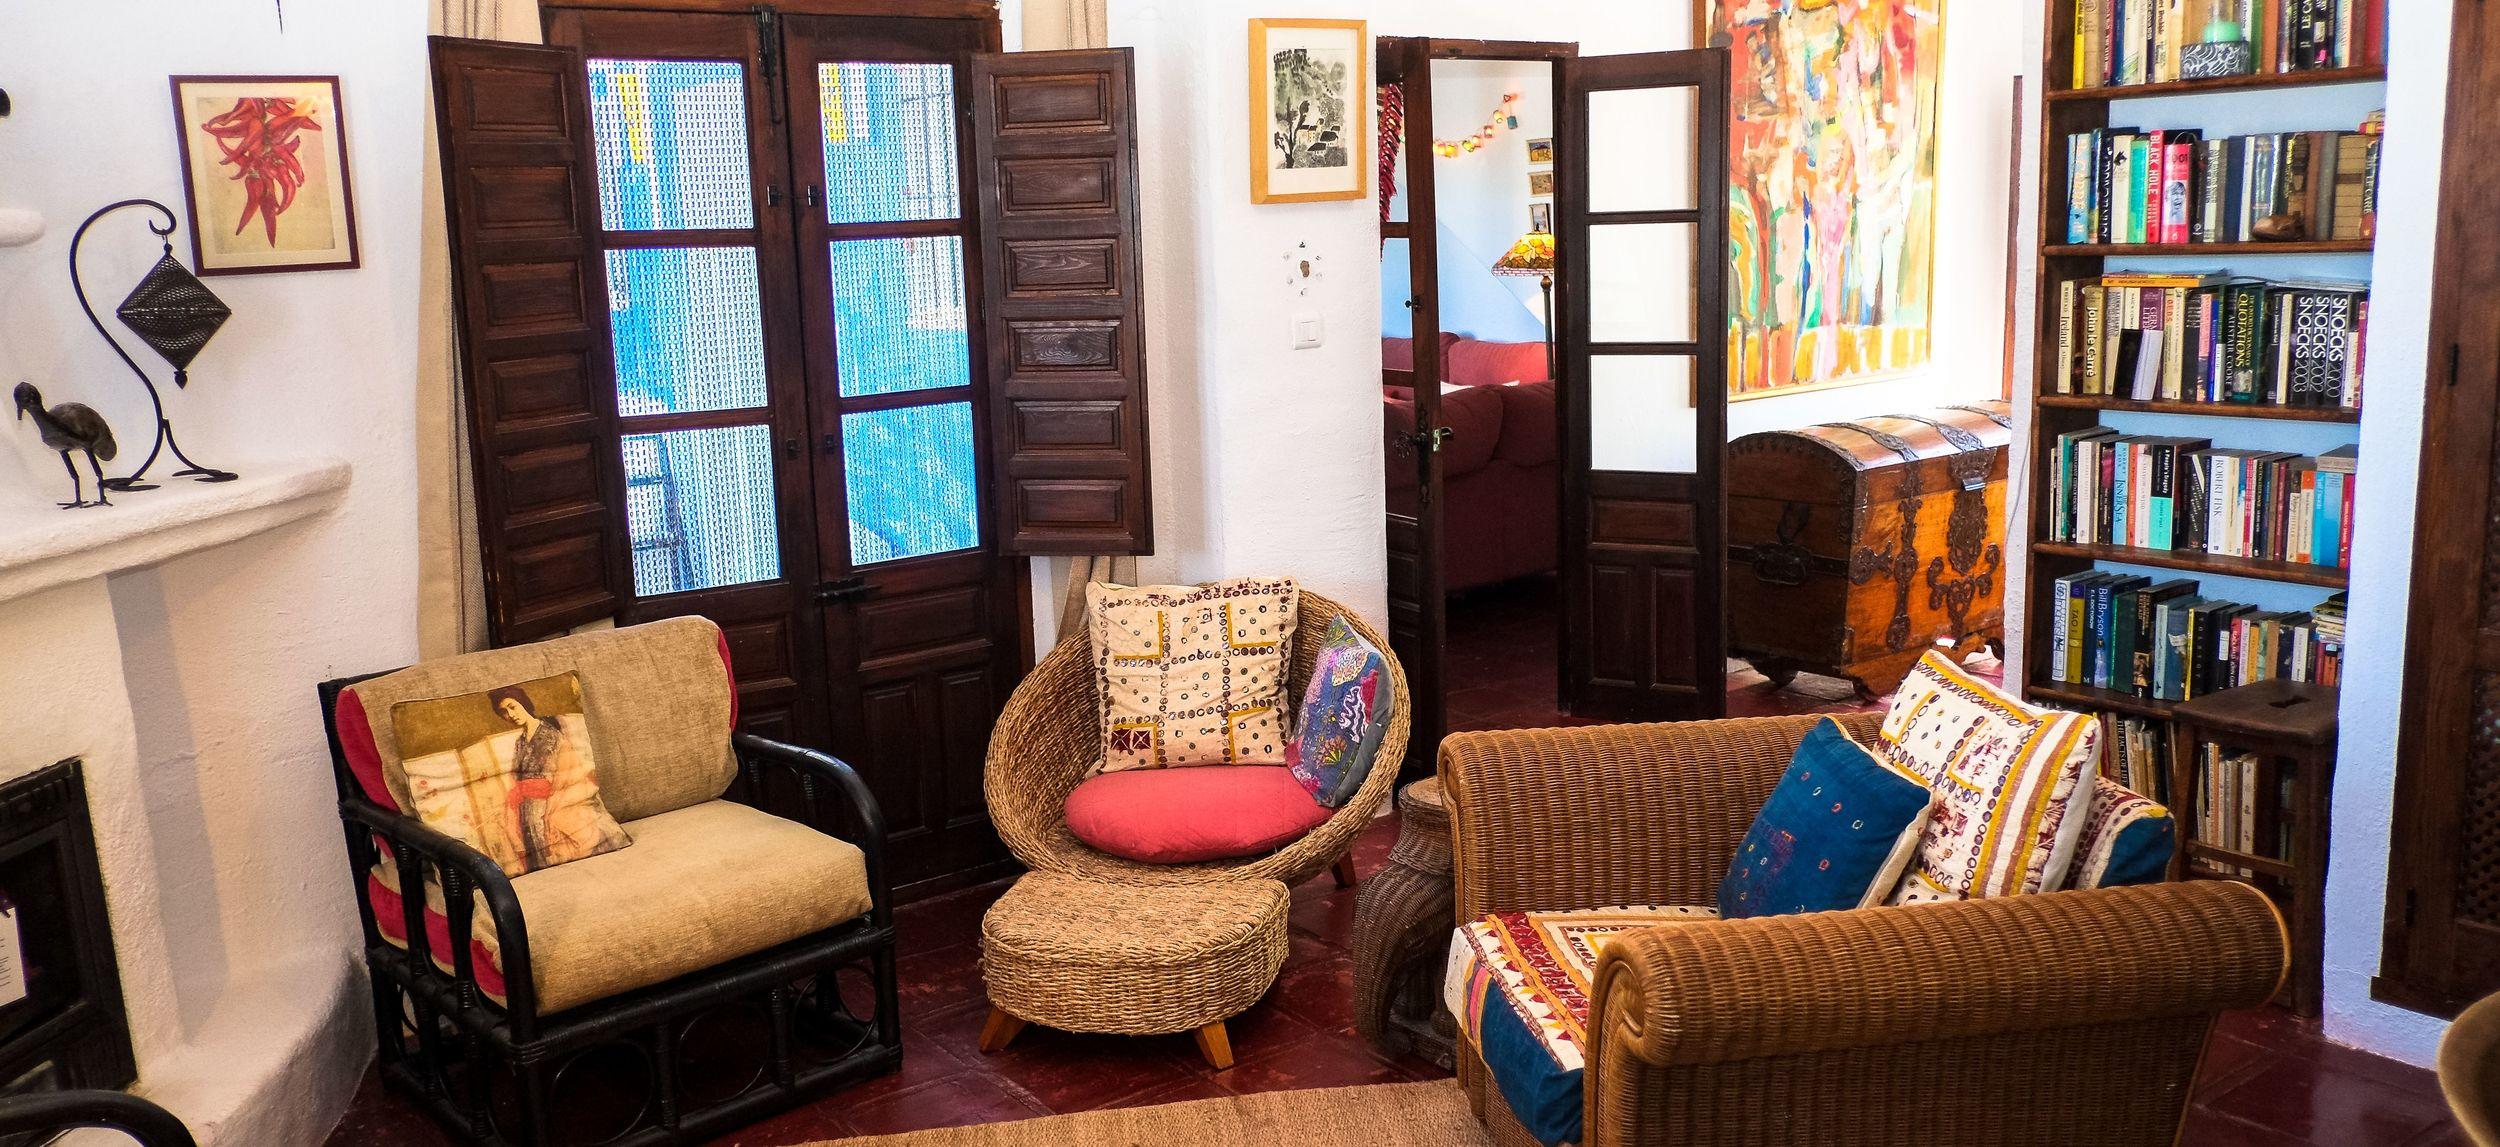 Villa Amapola lounge and library